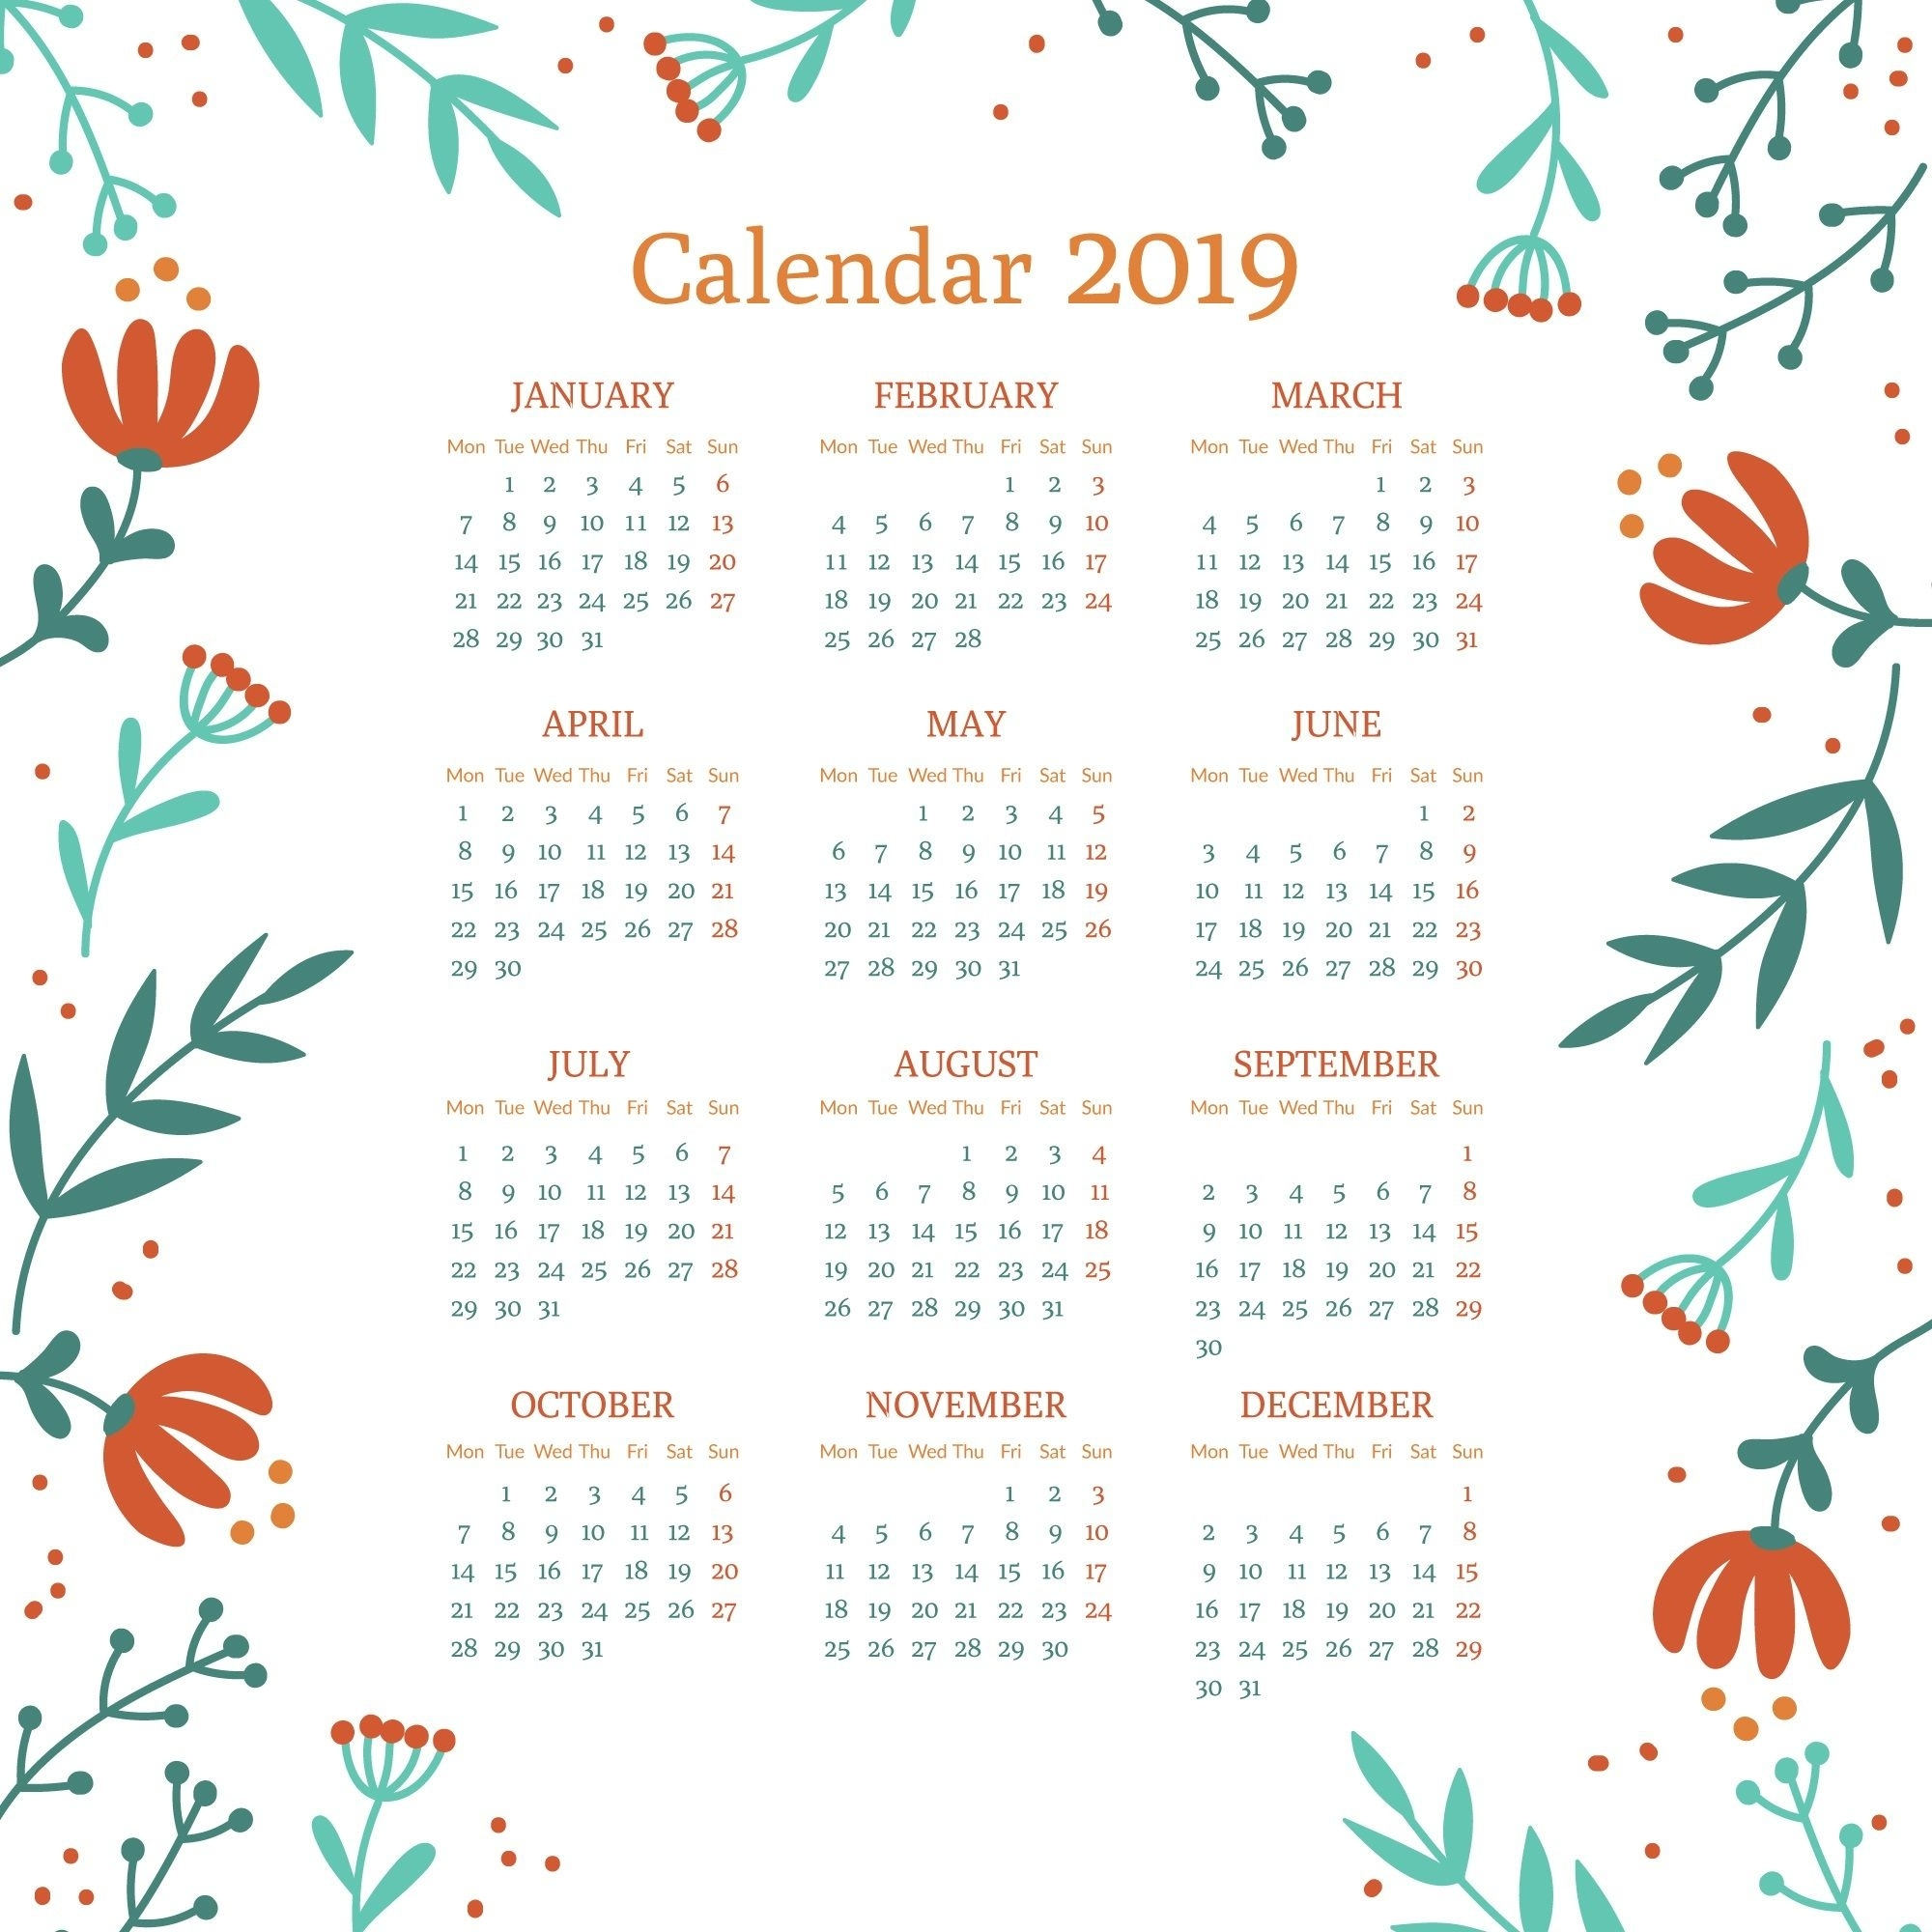 Floral 2019 Printable Calendar #2019Calendar #printablecalendar inside 2019 2020 Girly Calendar Printable